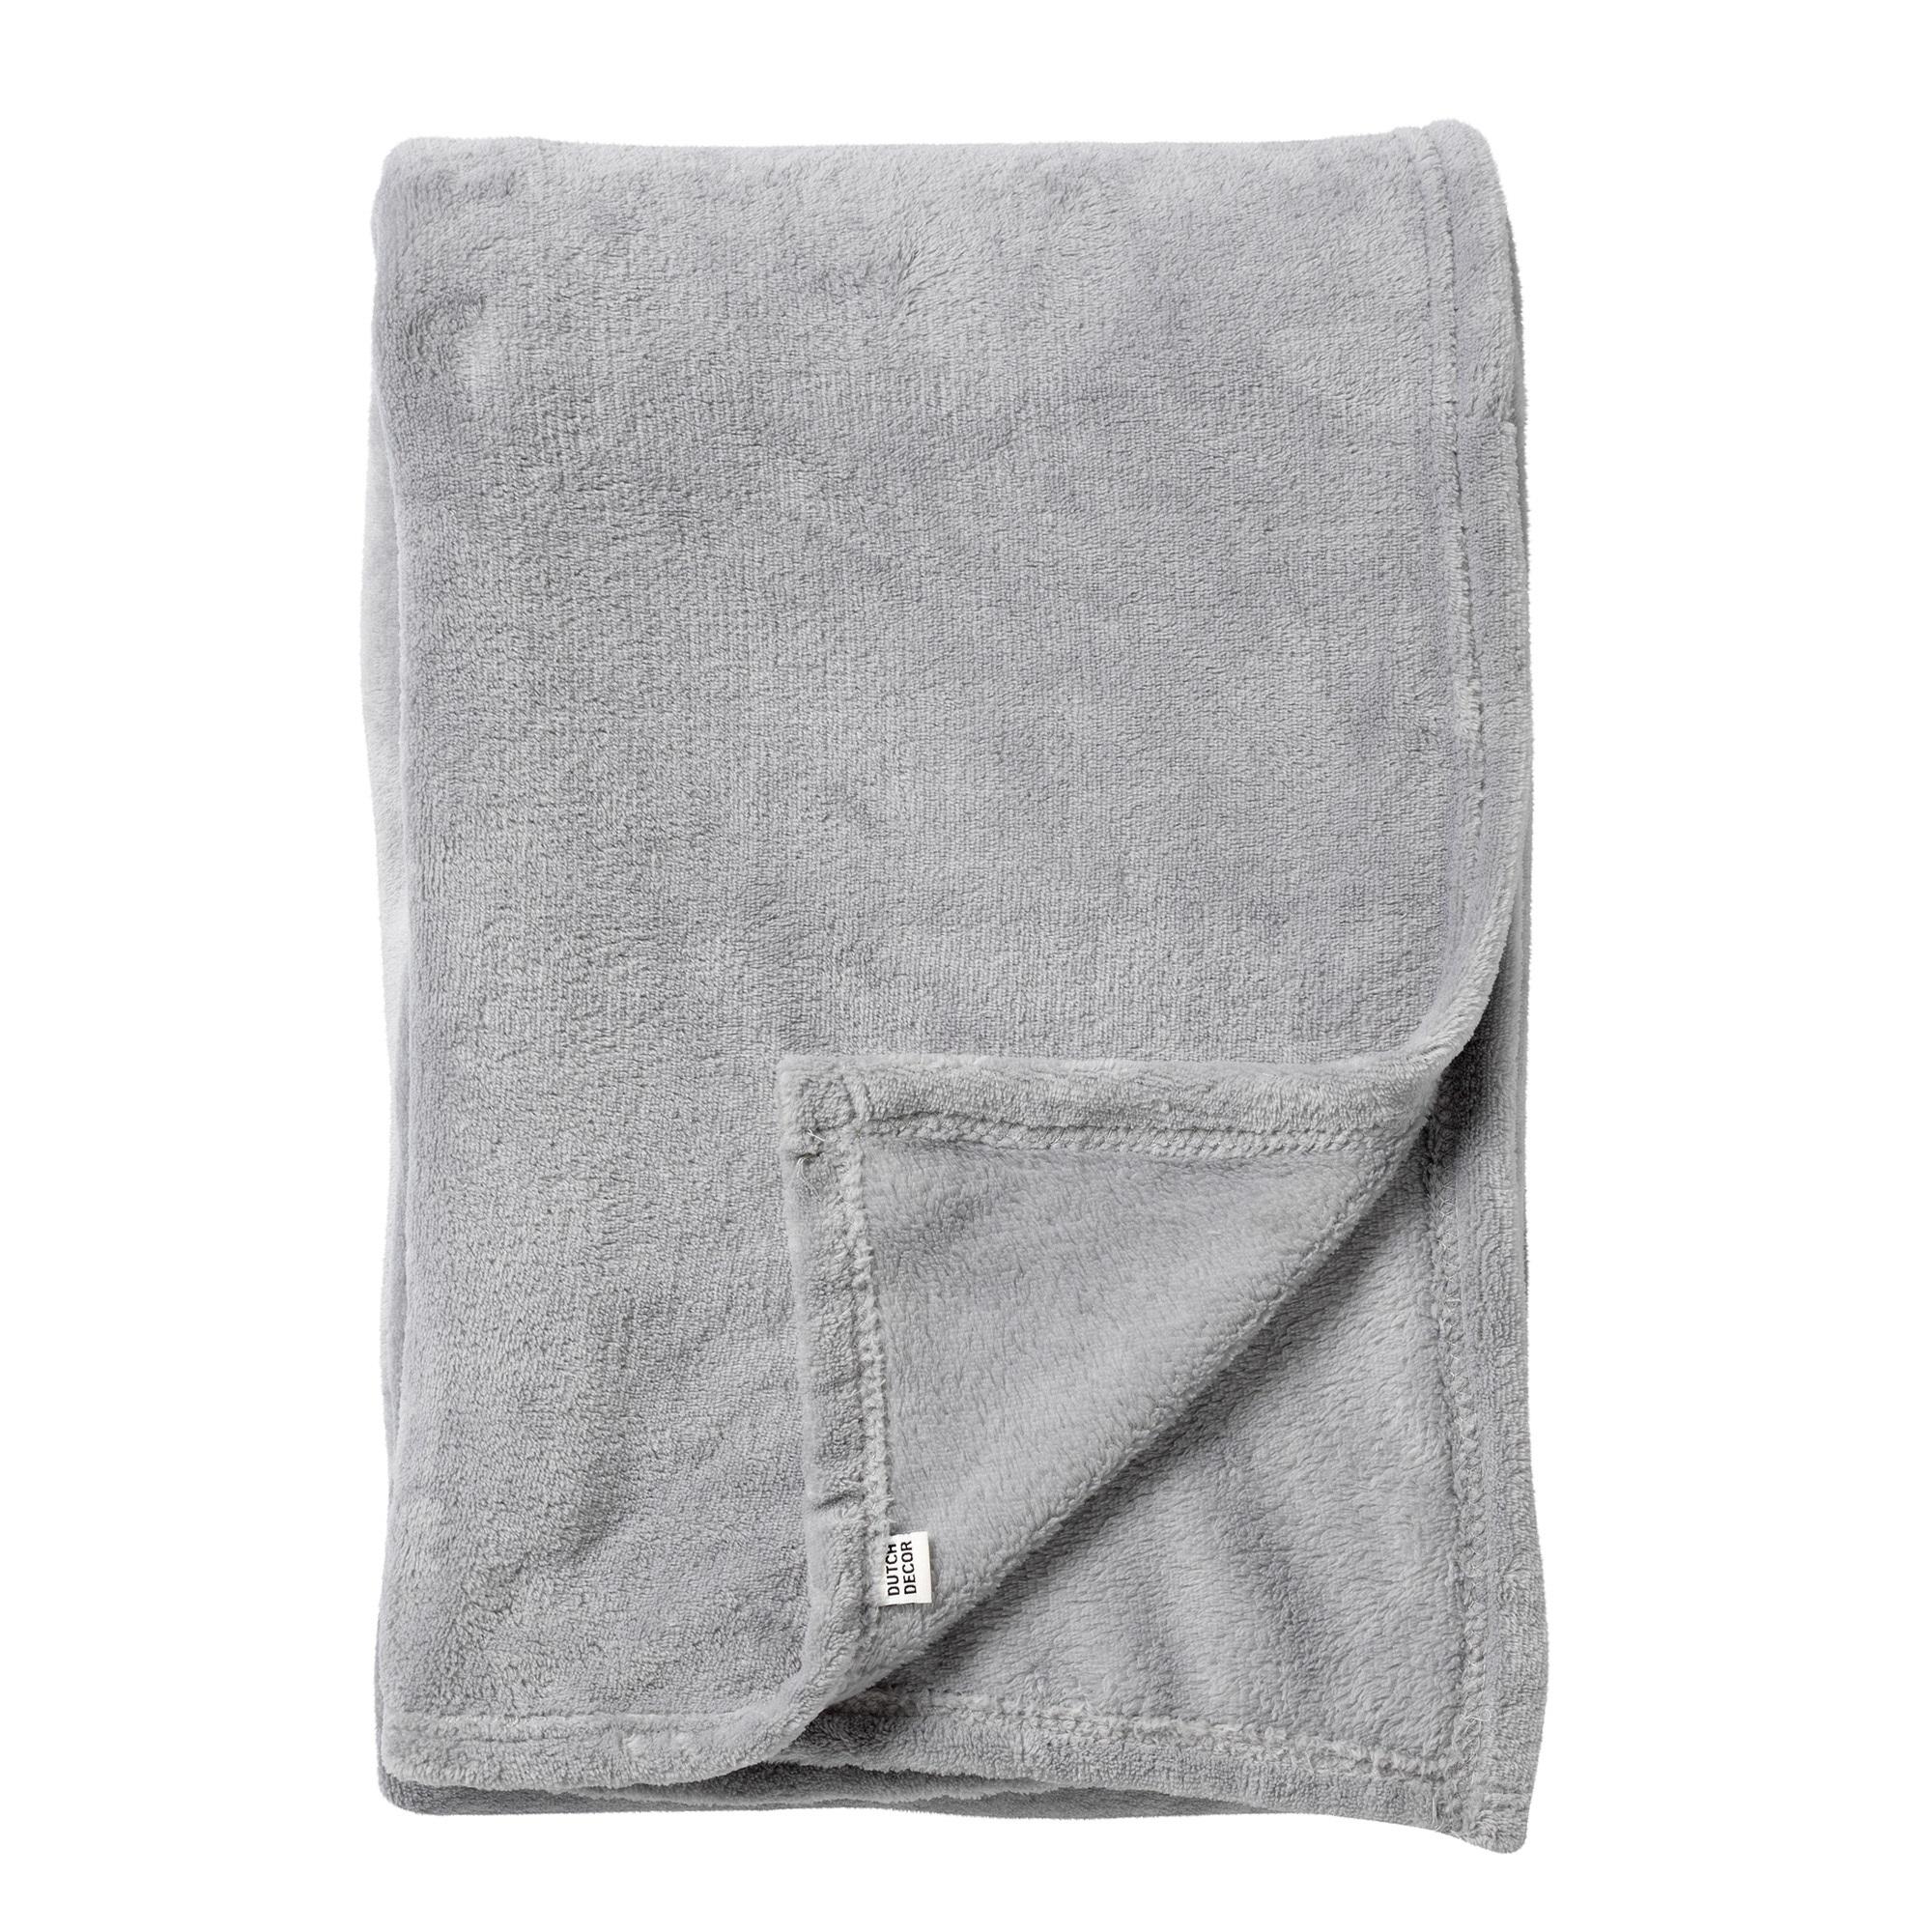 HARVEY - Plaid van fleece Micro Chip 150x200 cm